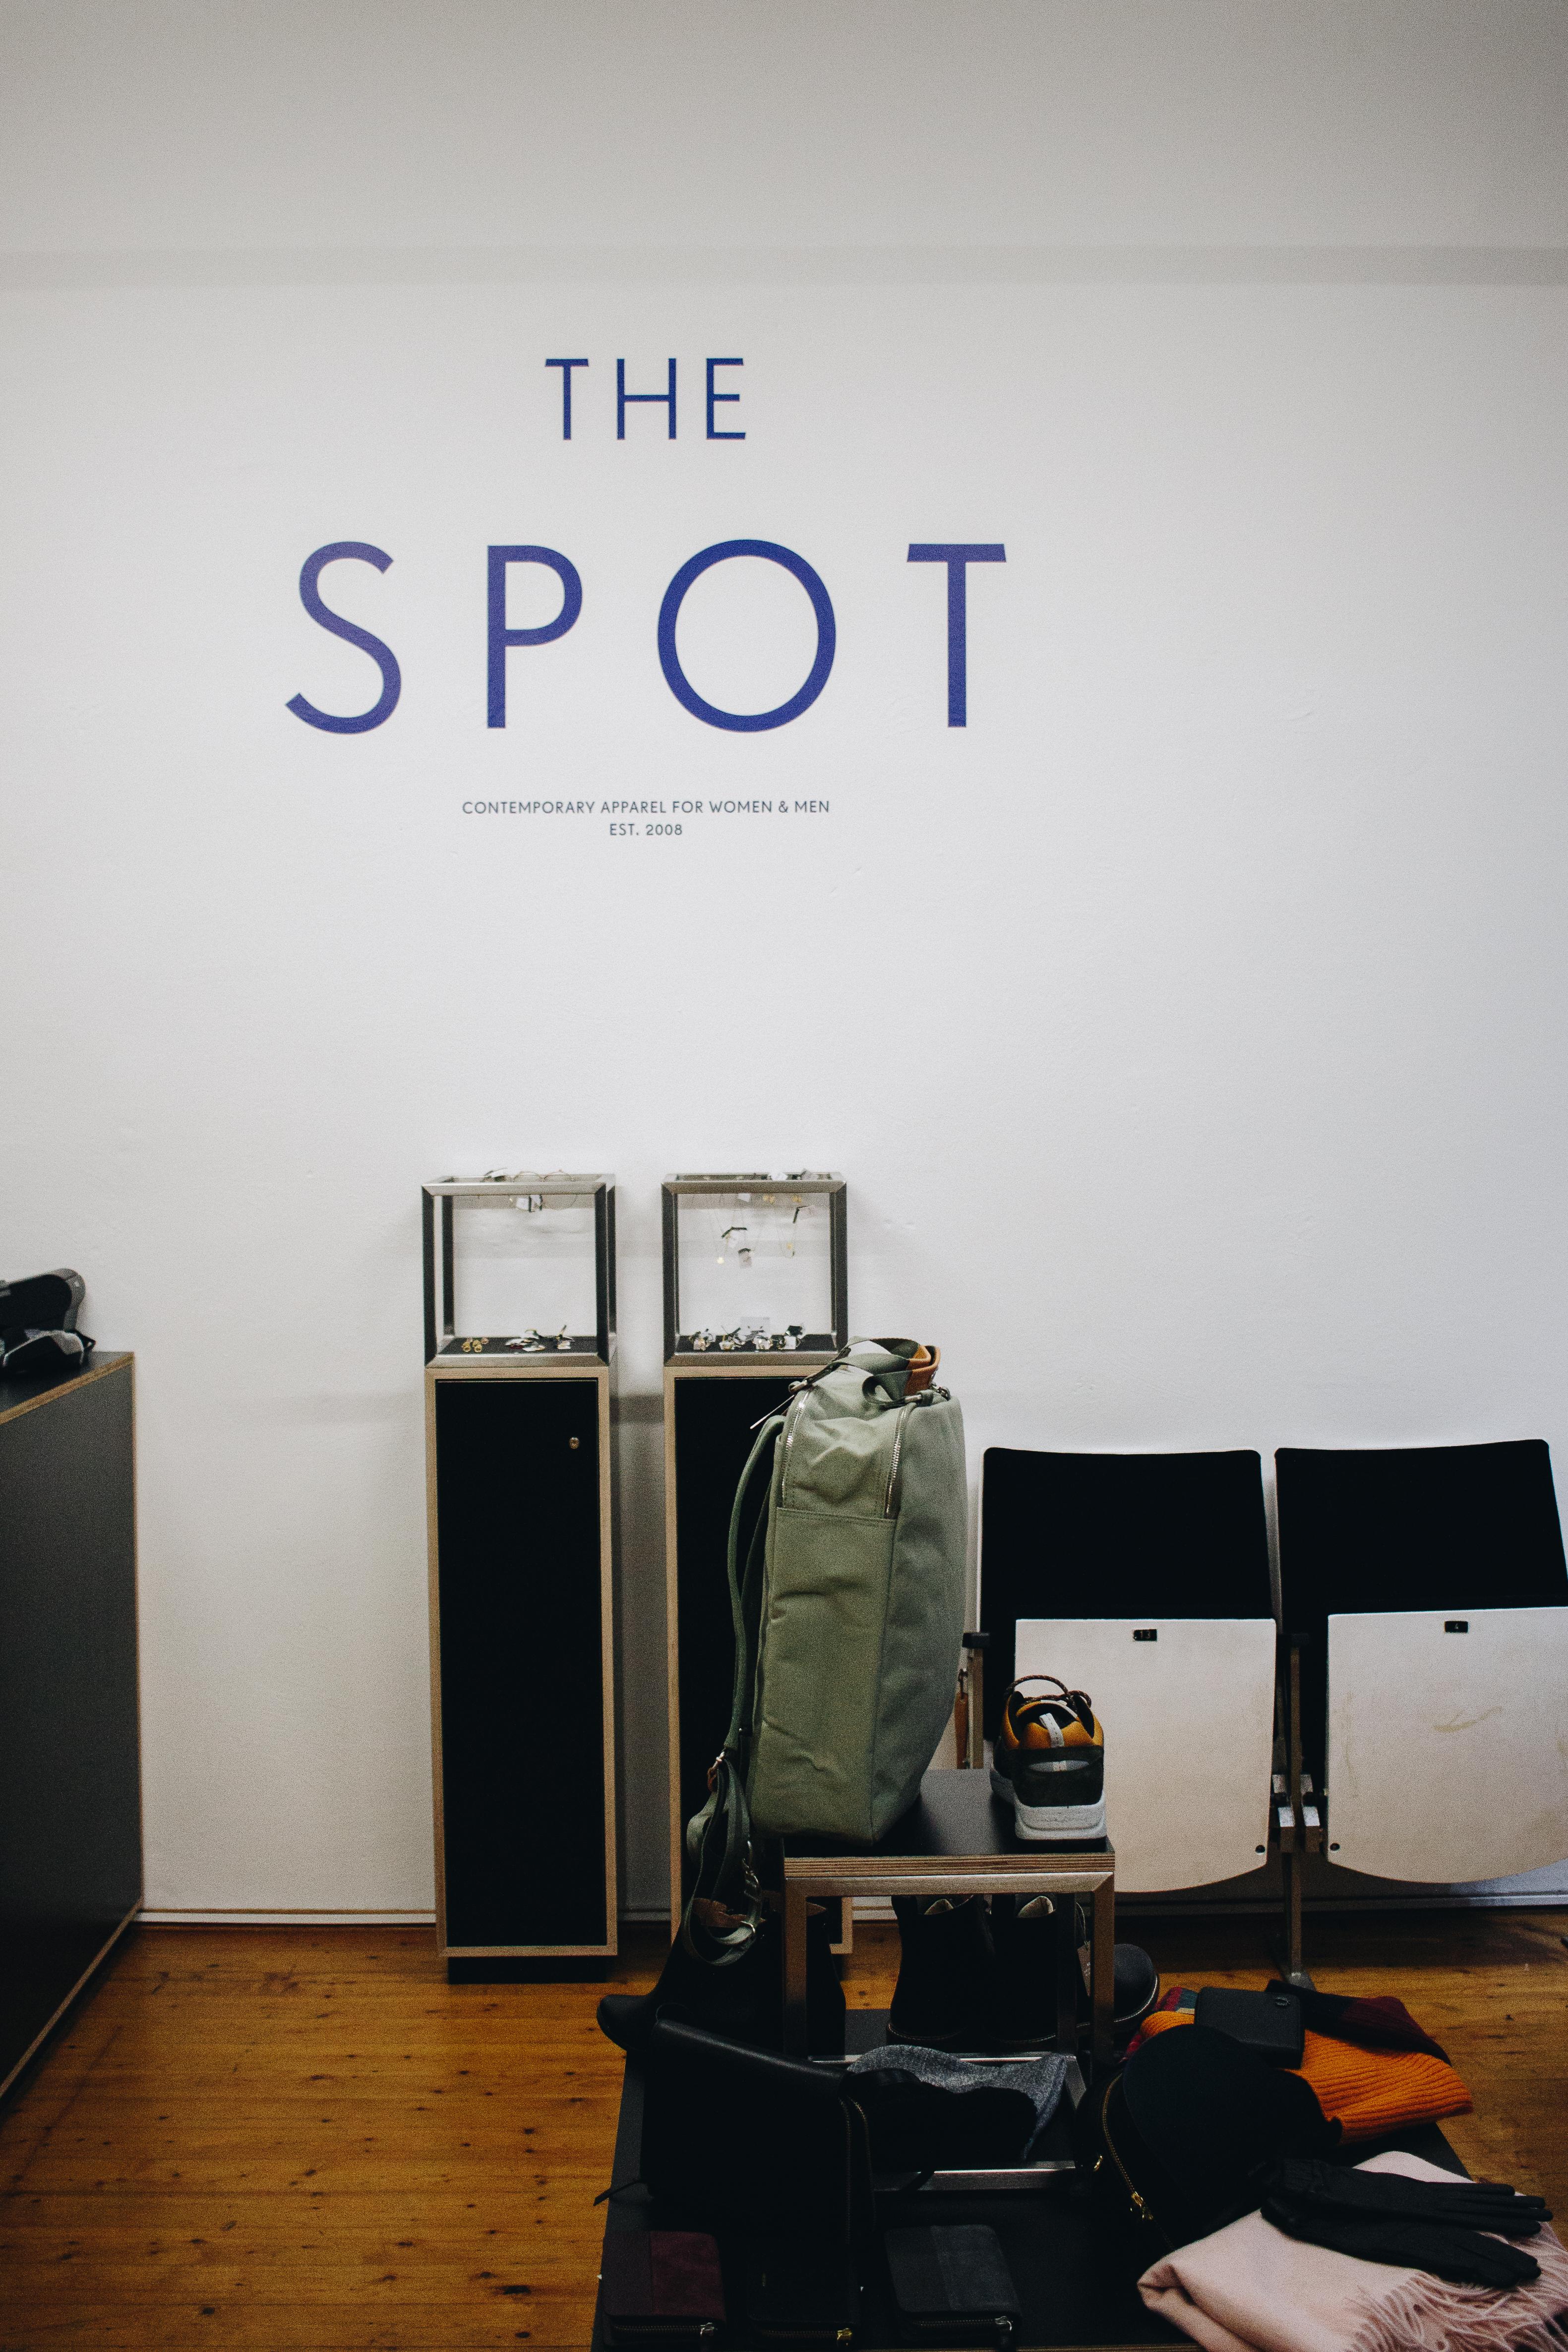 the spot-leipzig-fashion-annabelle sagt0